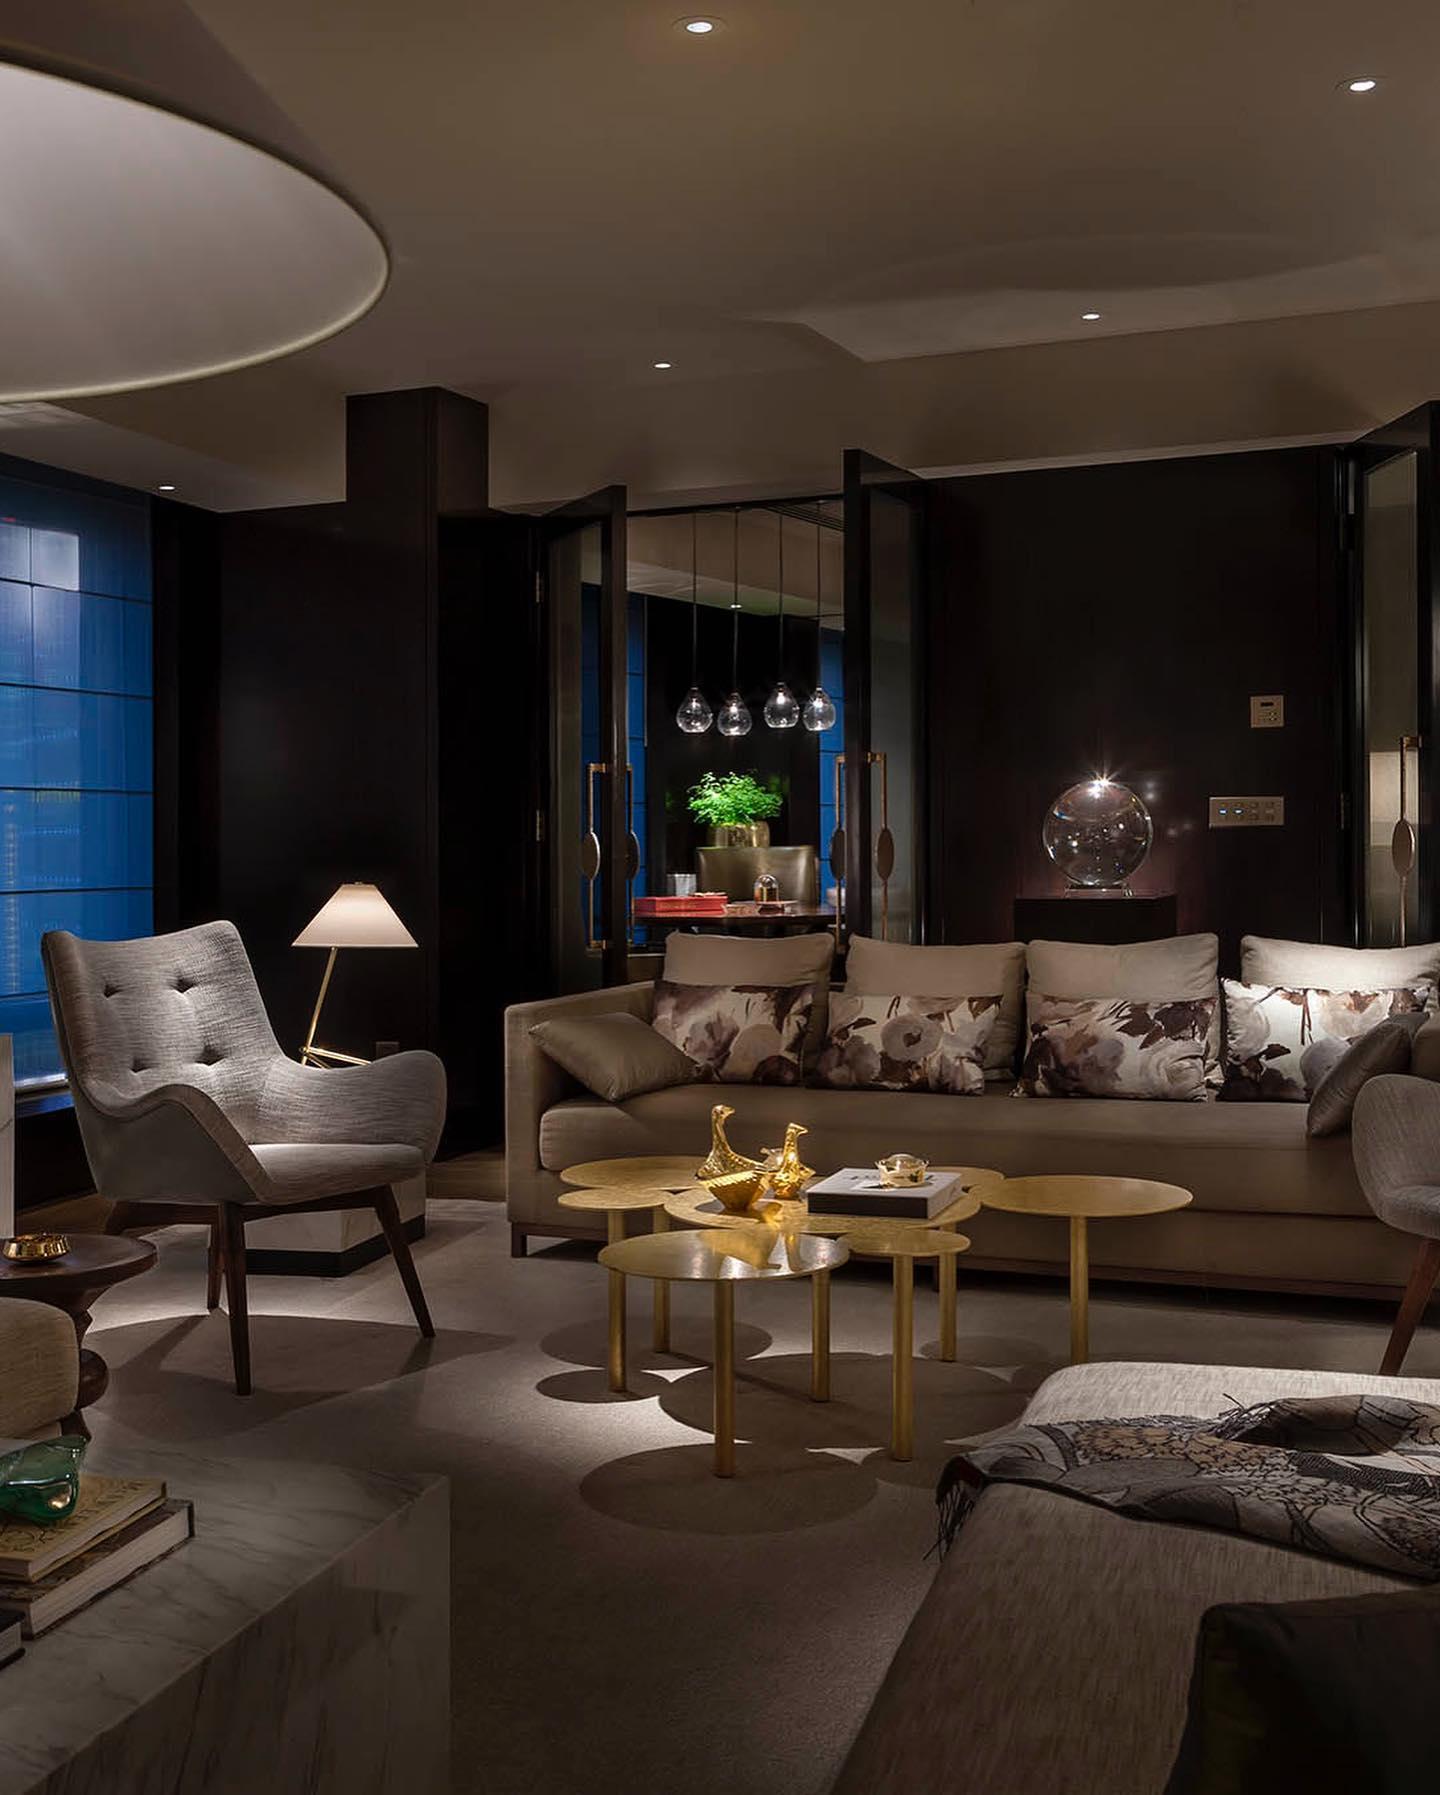 Rosewood Beijing, luna de miel en China, hoteles para luna de miel en China - Wedding Hub - 017